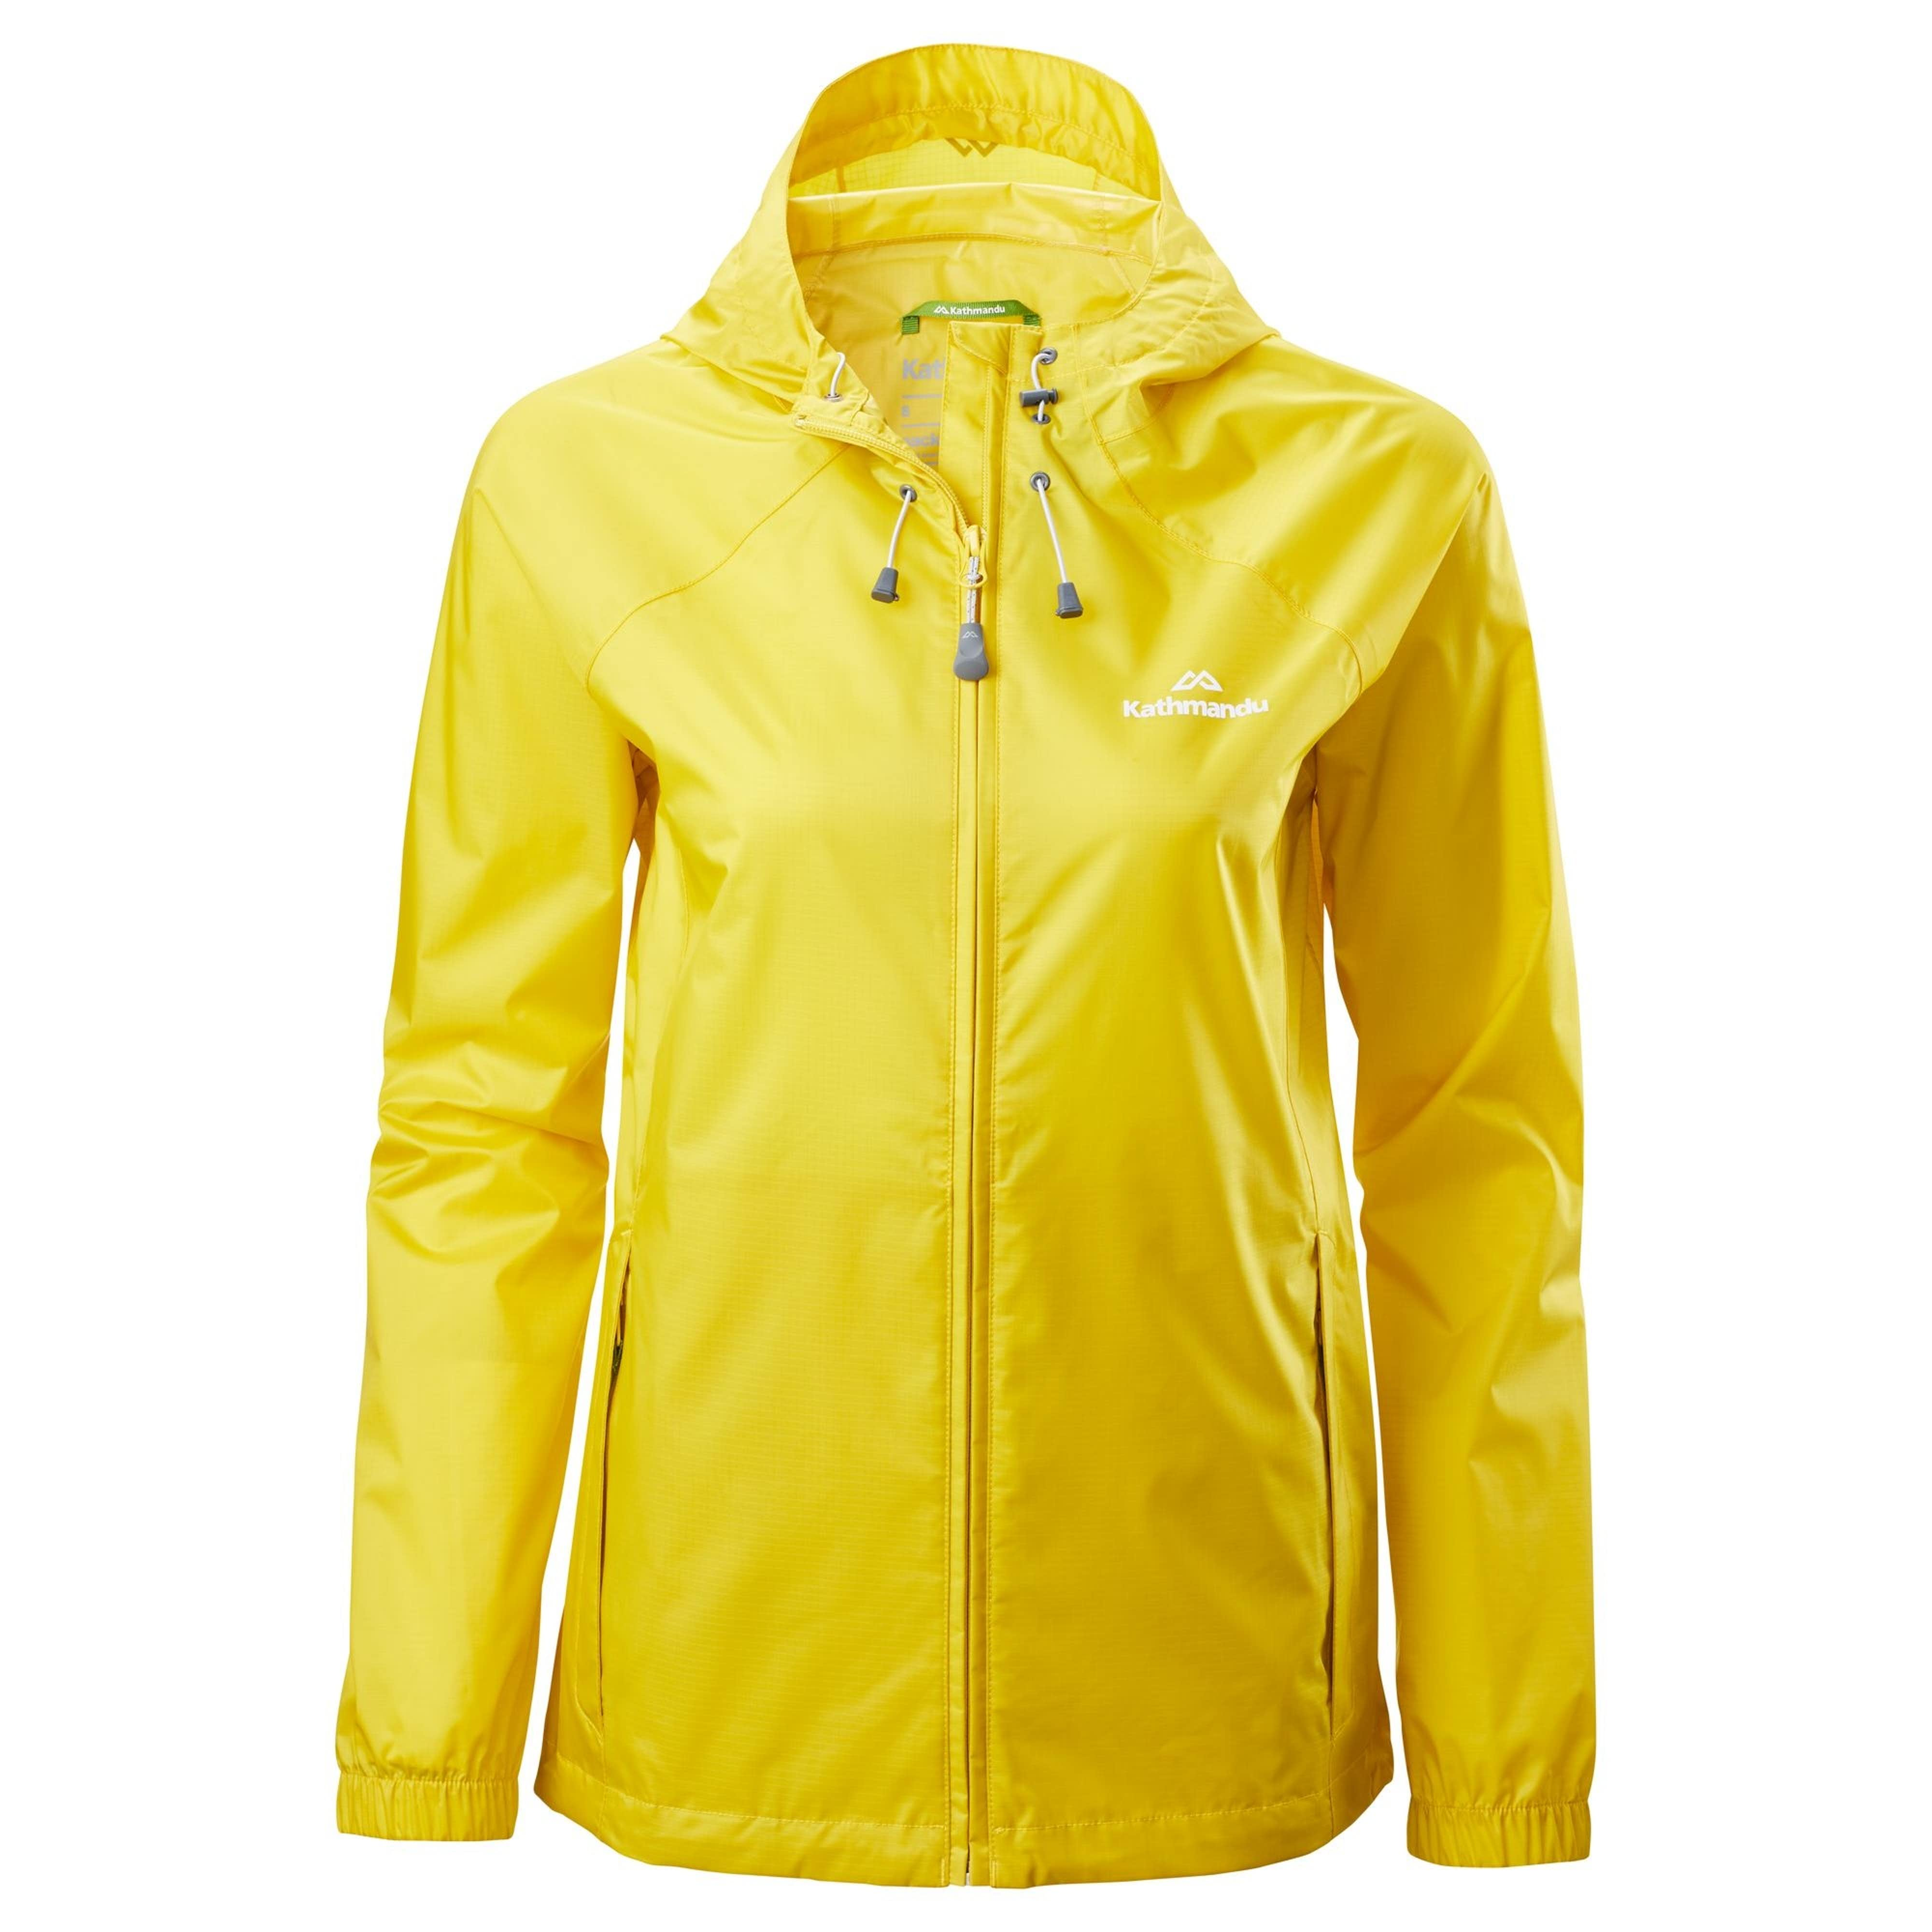 091820c36f1 Pocket-it Women s Rain Jacket v3 - Salsa